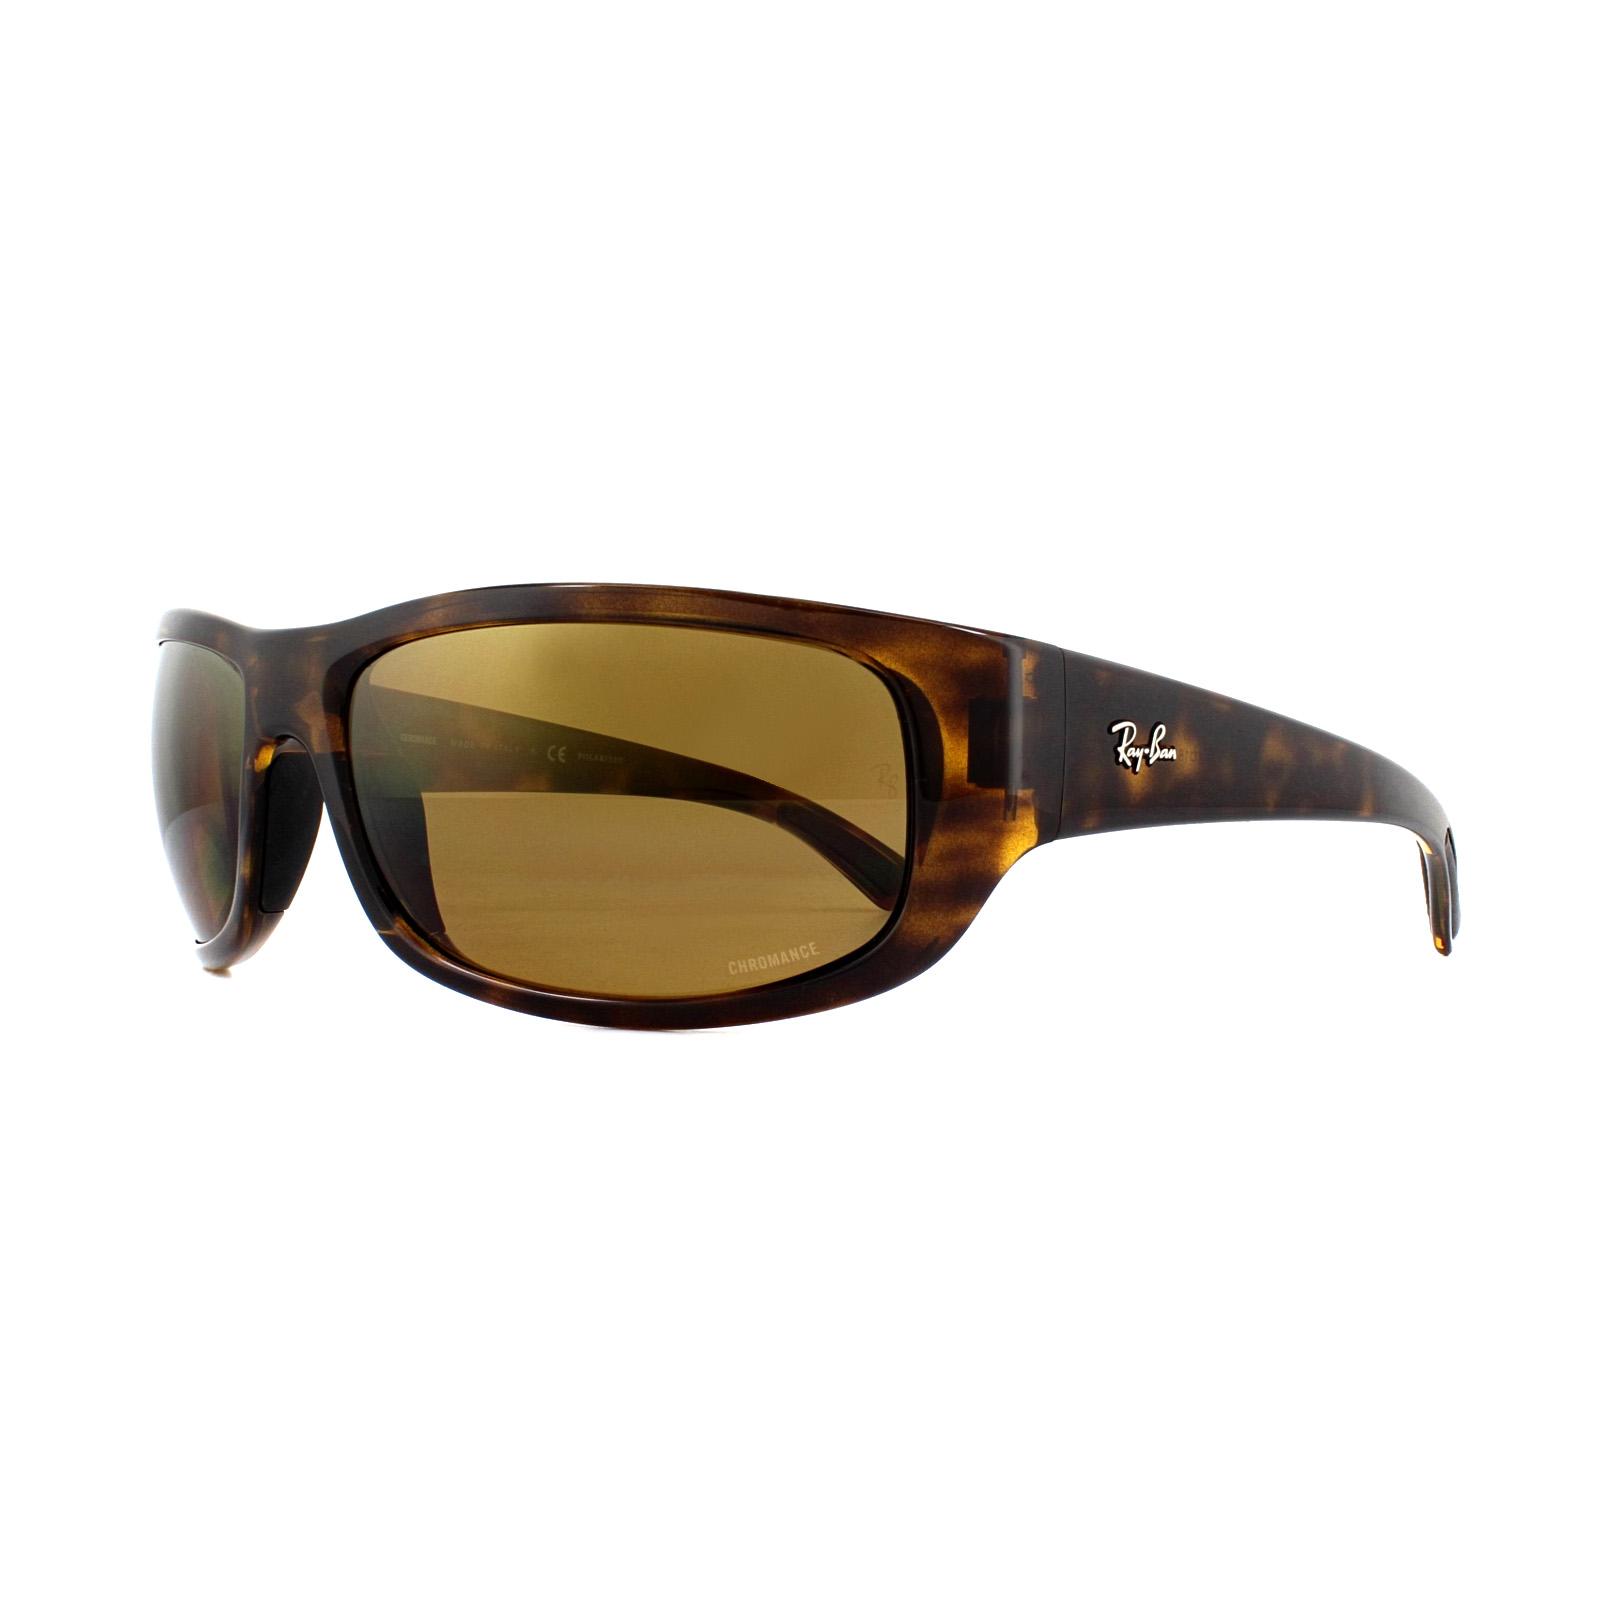 e29e2c9996 Sentinel Ray-Ban Sunglasses 4283CH Chromance 710 A3 Havana Bronze Mirror  Polarized